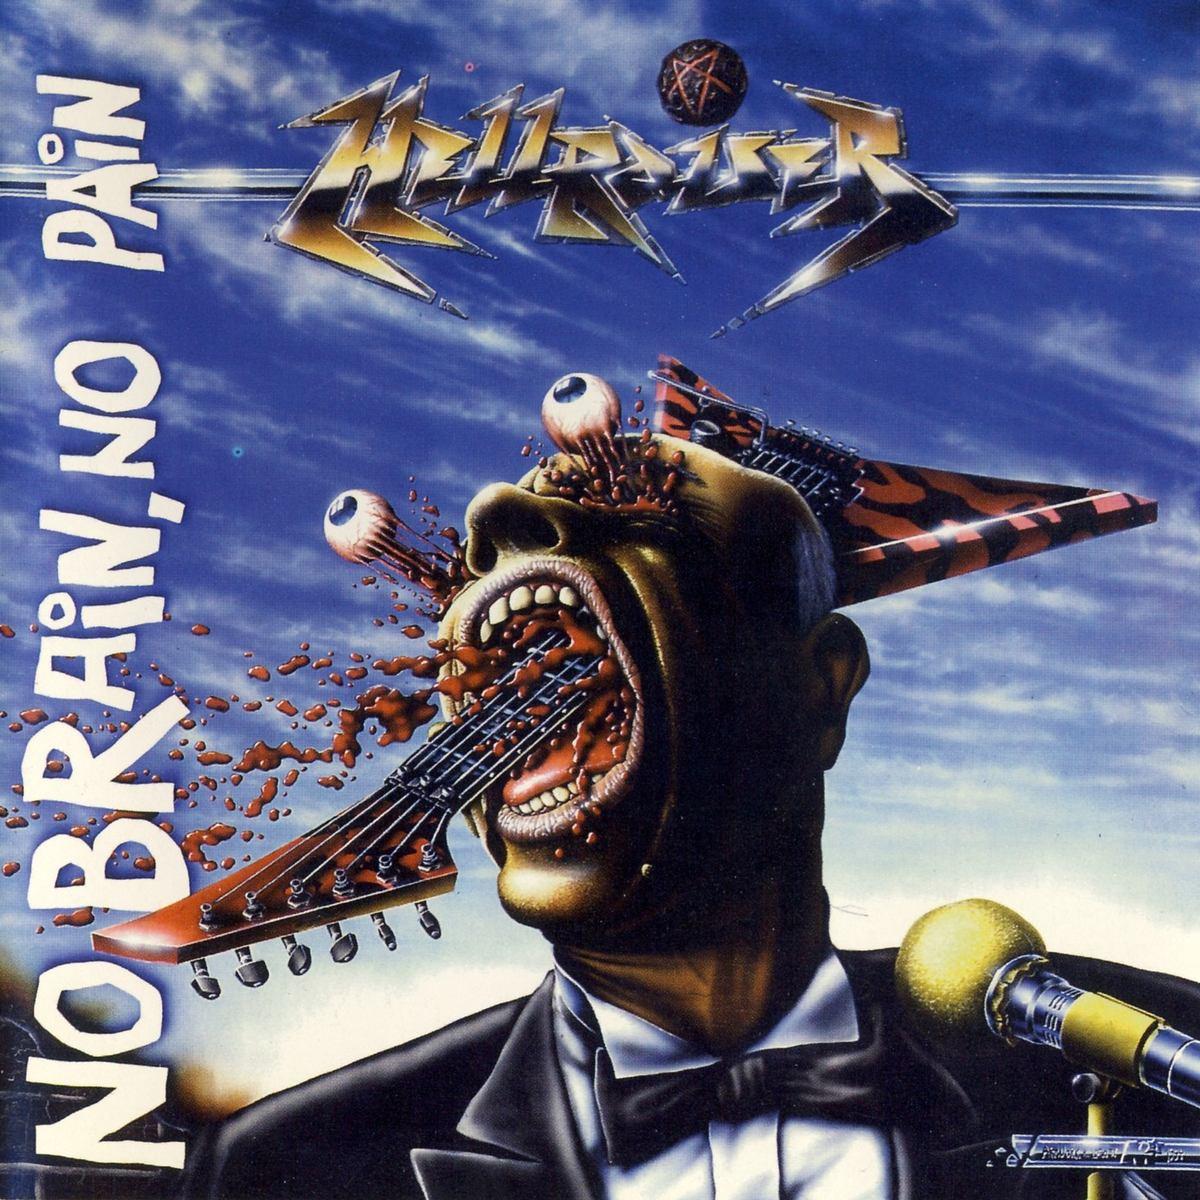 Hellraiser - No Brain, No Pain